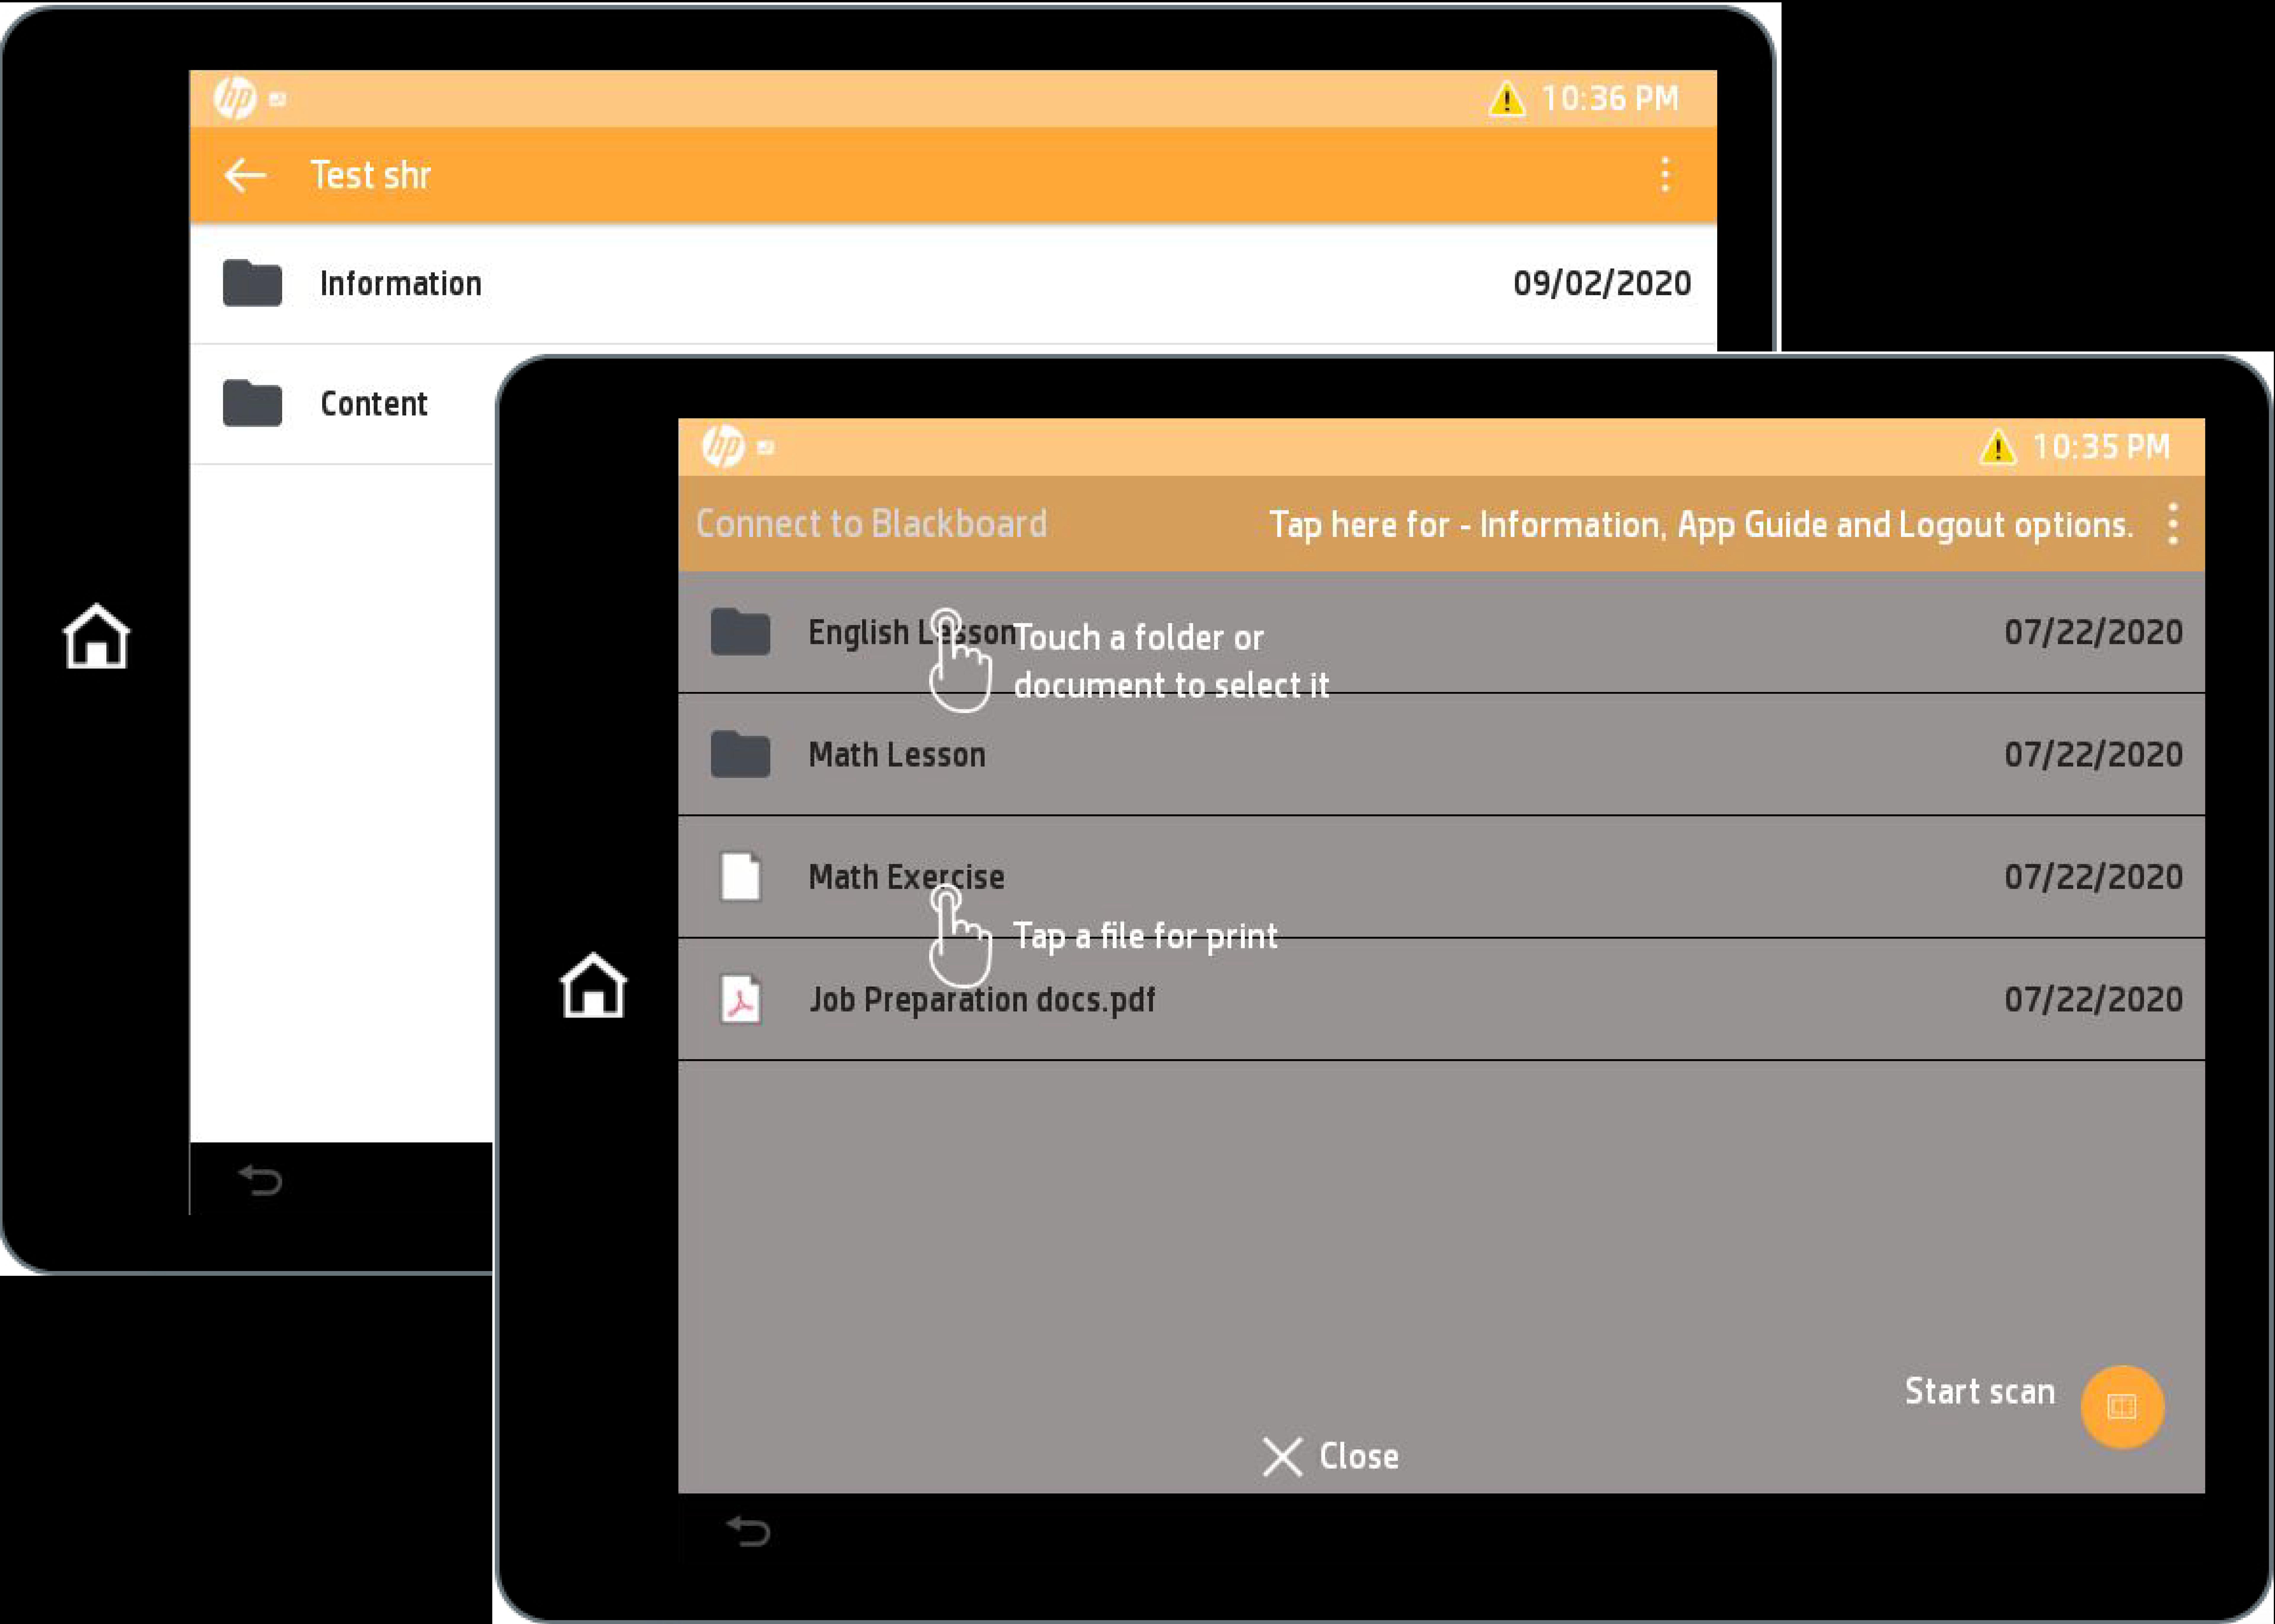 Connect To Blackboard Screenshot